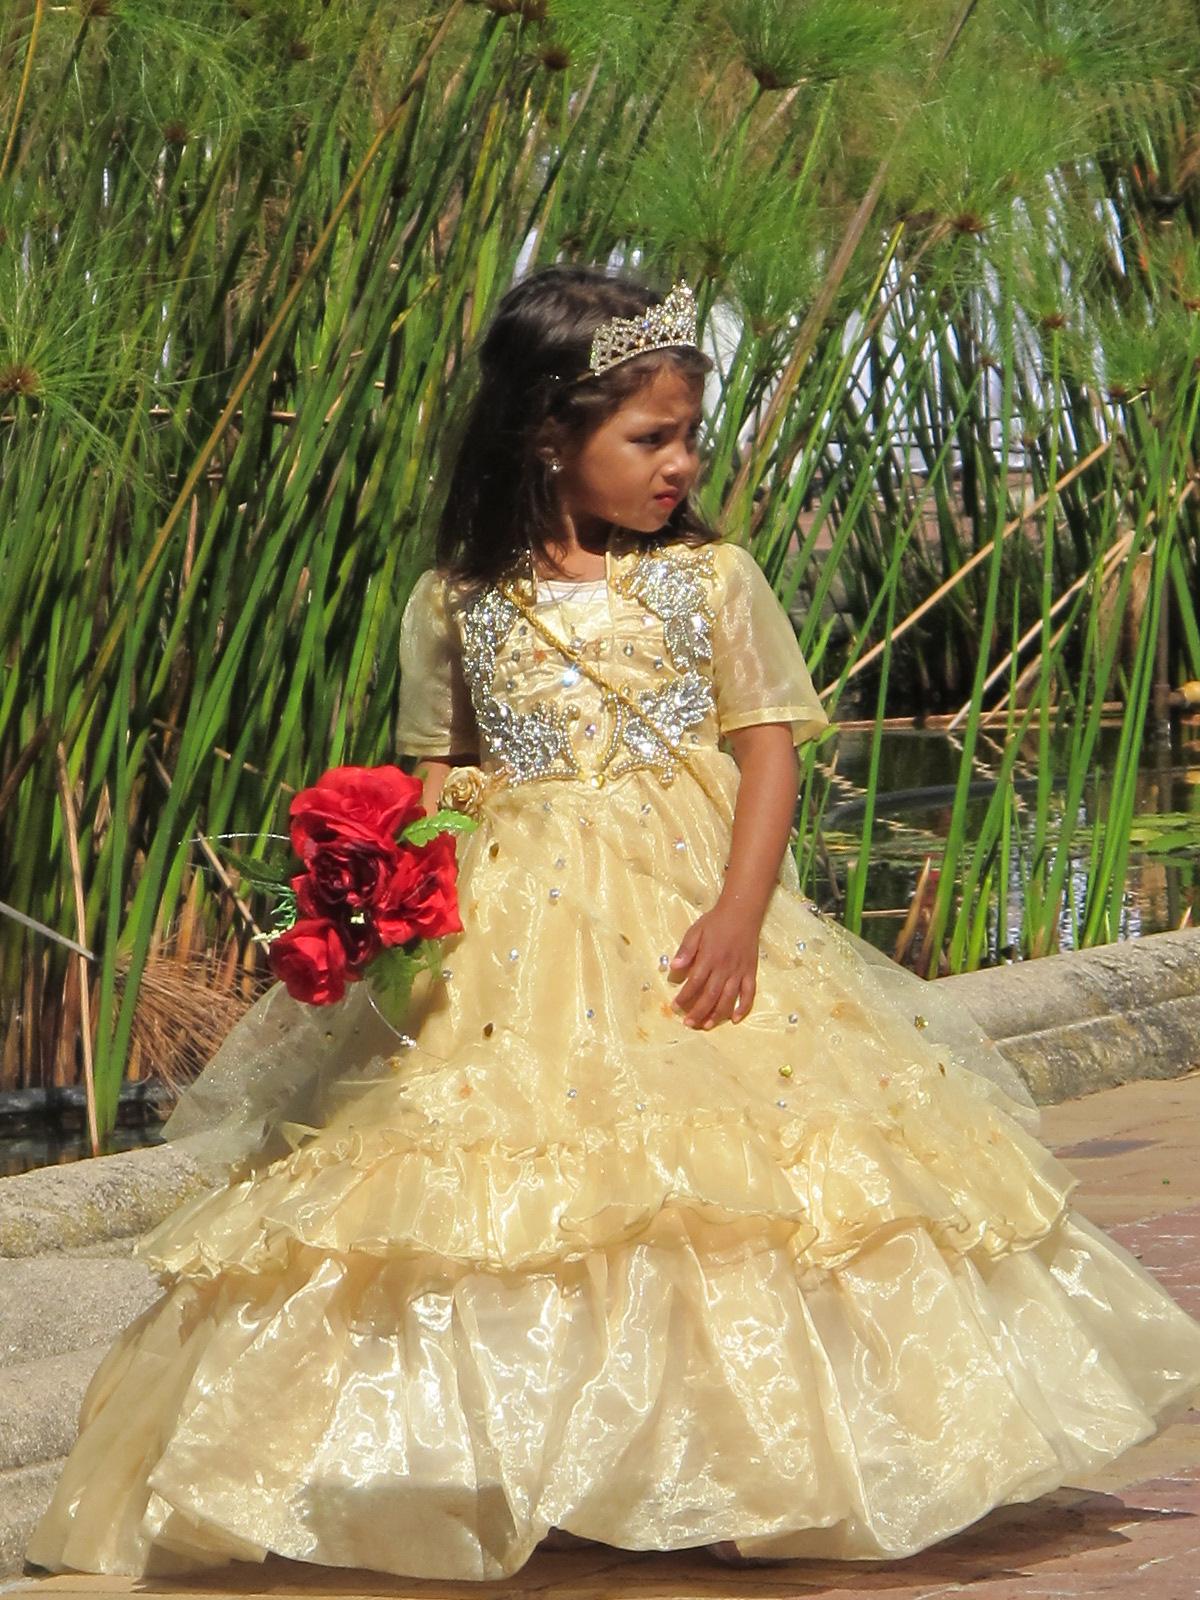 Muslim Wedding Dresses Cape Town : Cape town south africa part adventuresinfoodandculture